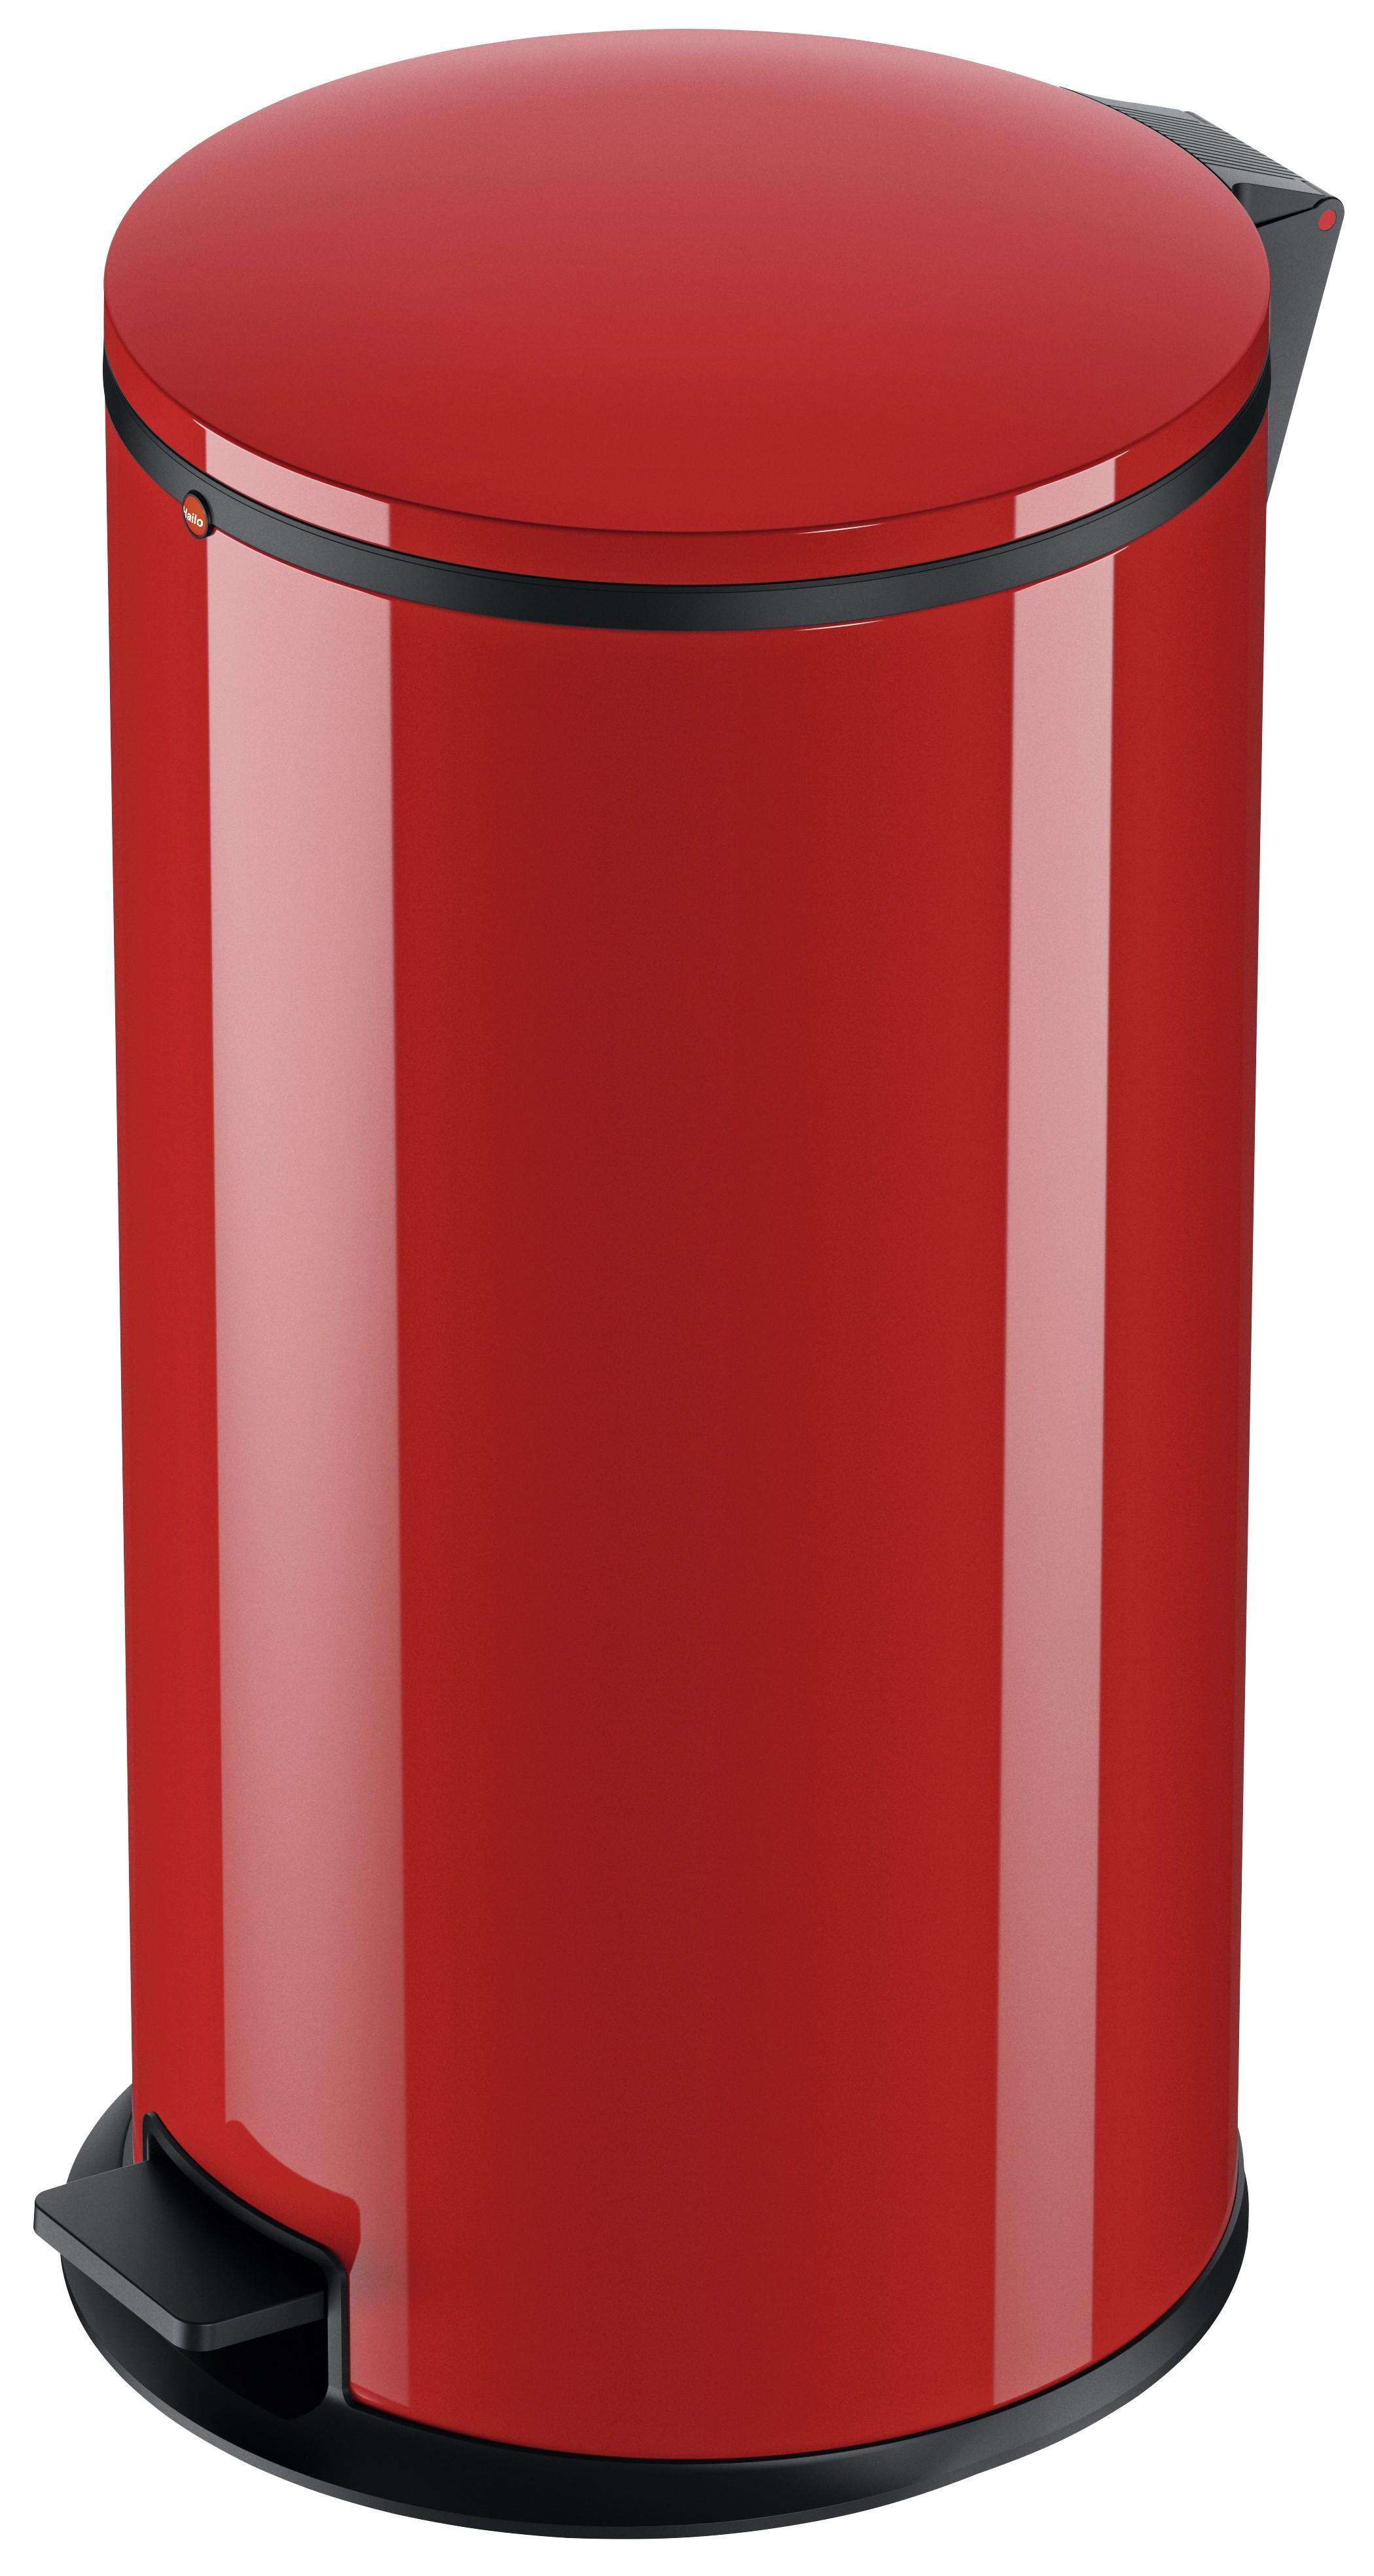 Hailo Pure XL, Stahlblech rot, 44 Liter, Inneneimer: verzinkt, Tret-Abfallsammler